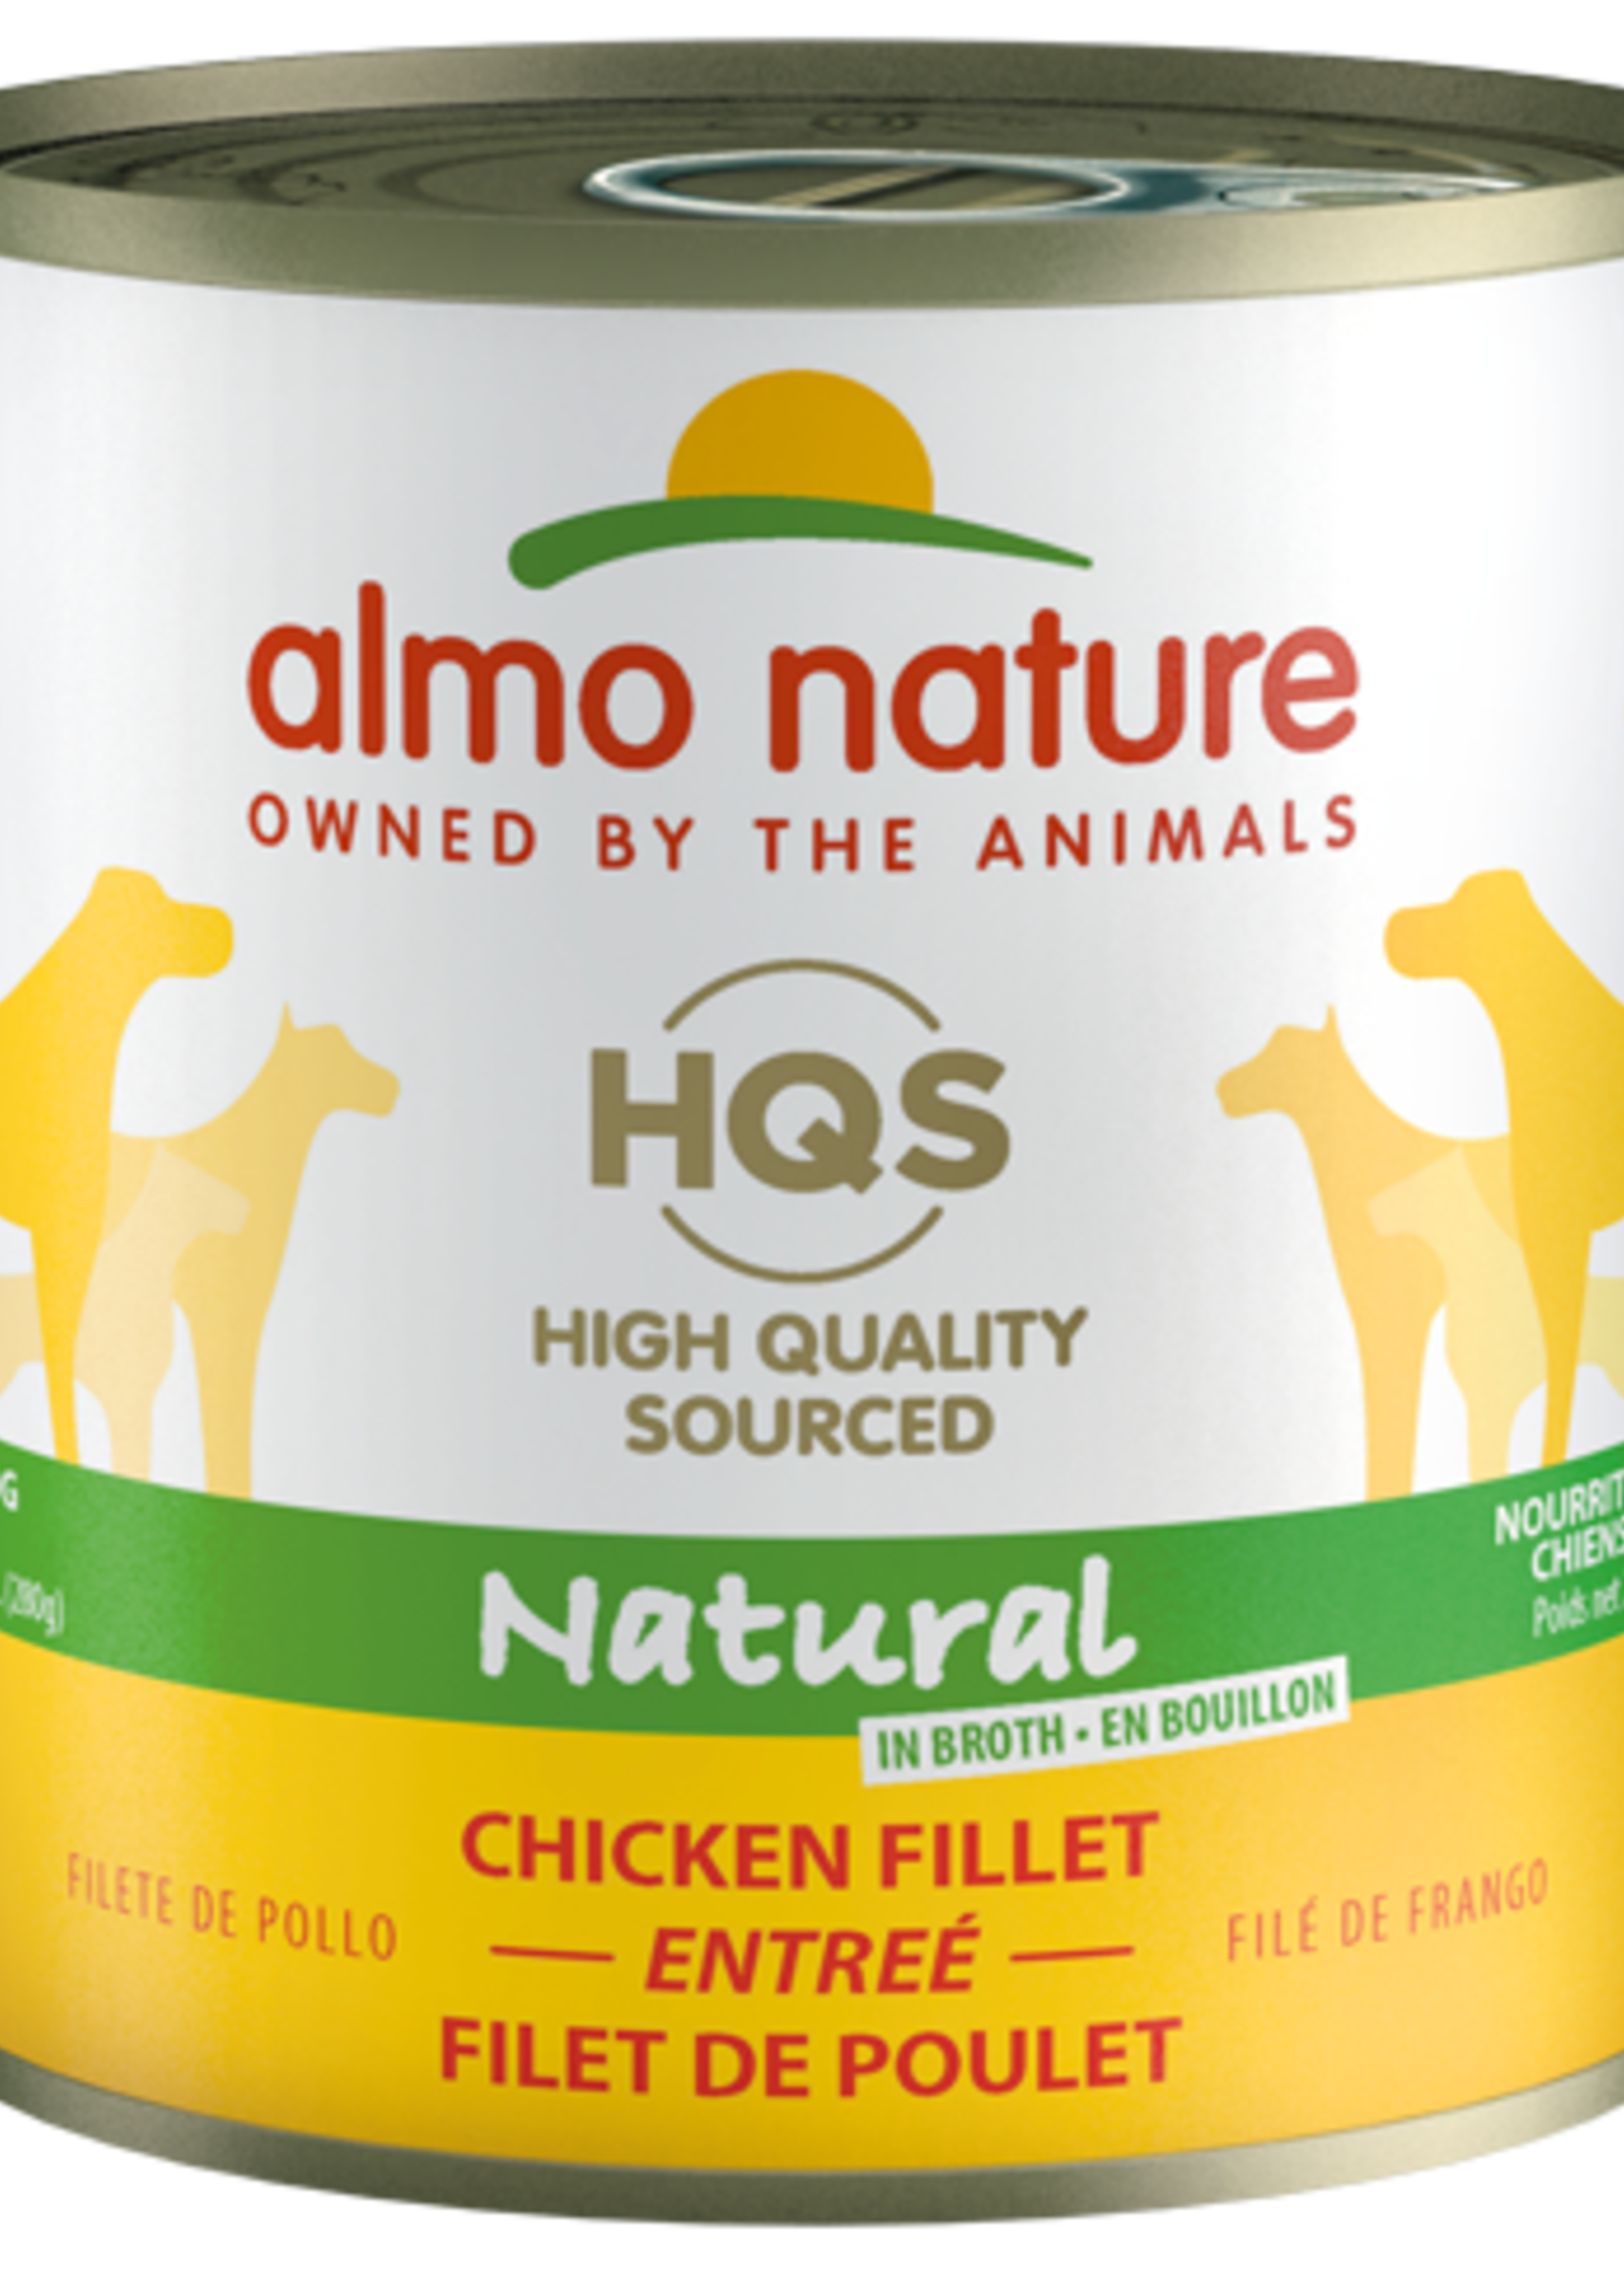 Almo Nature© Almo Nature HQS Natural Chicken Fillet Entrée 280g